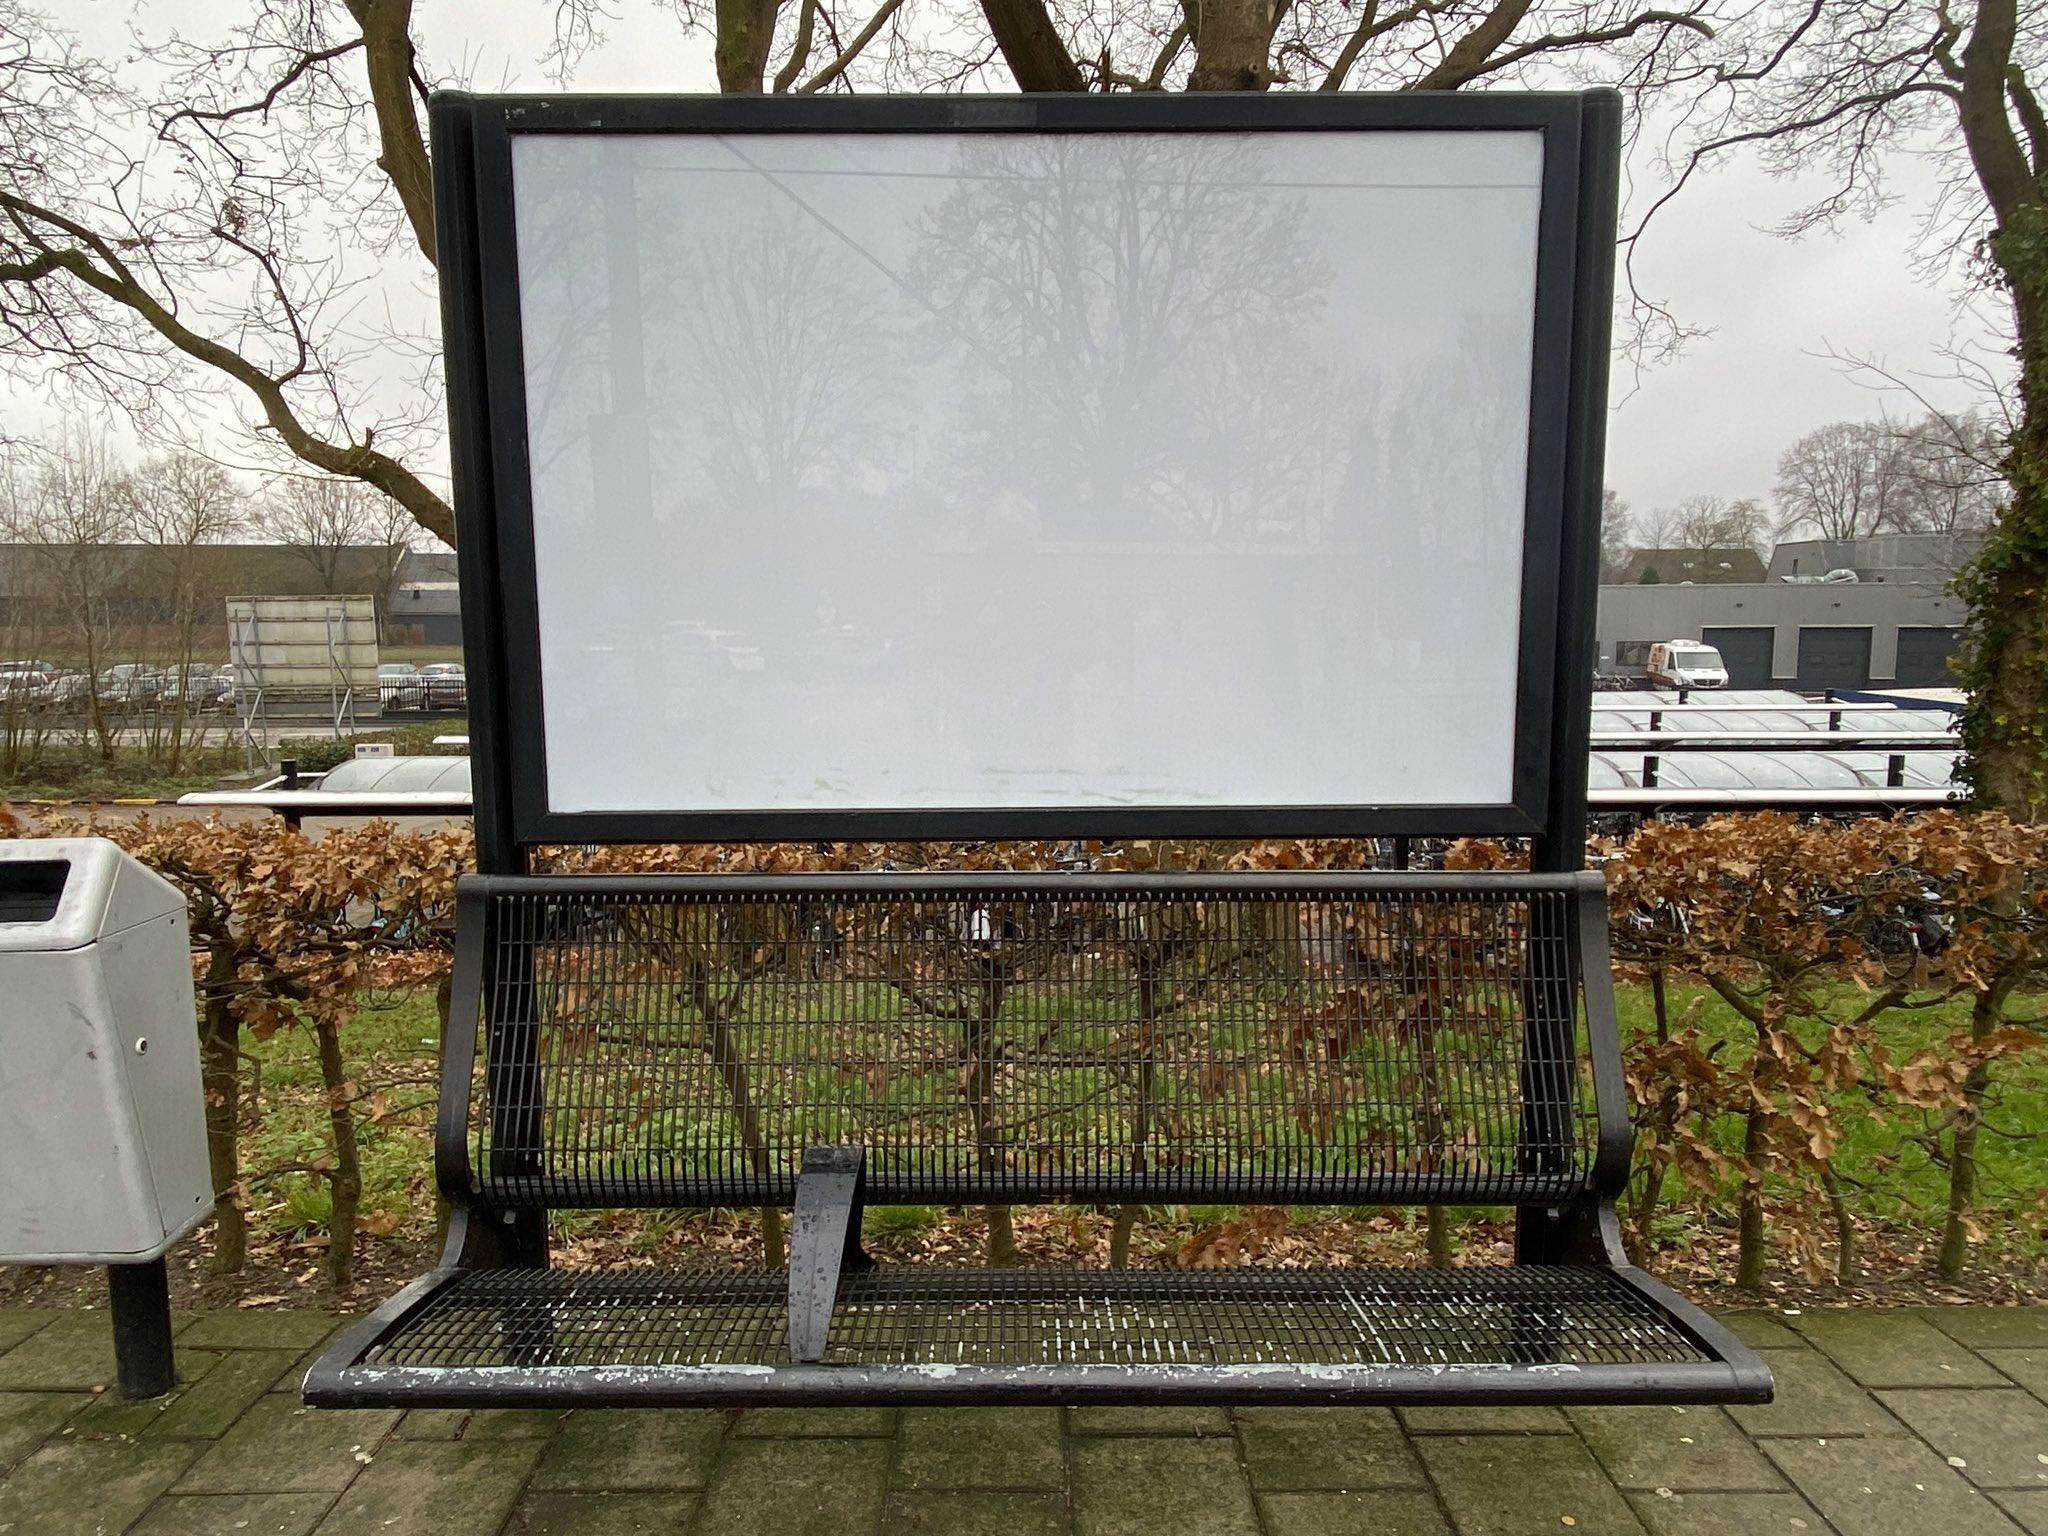 rt-arthurskm-voor-walkersbenches-wandelbankjes-reclamevrij-station-veenendaal-de-klomp-https-t-co-cghnxdybz9